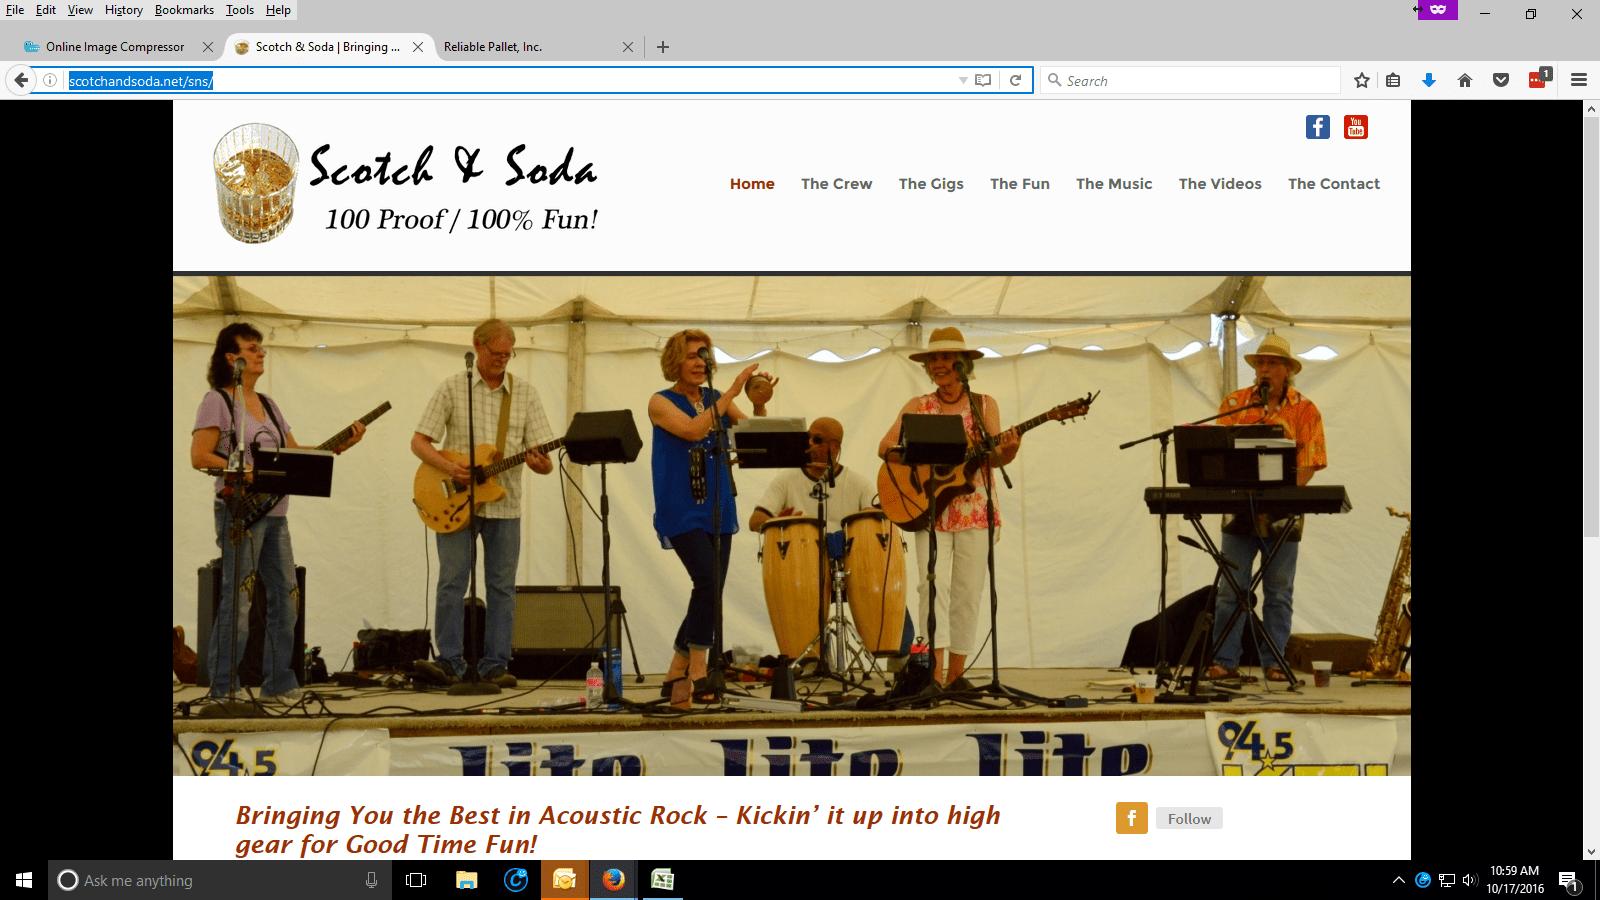 Scotch & Soda Band